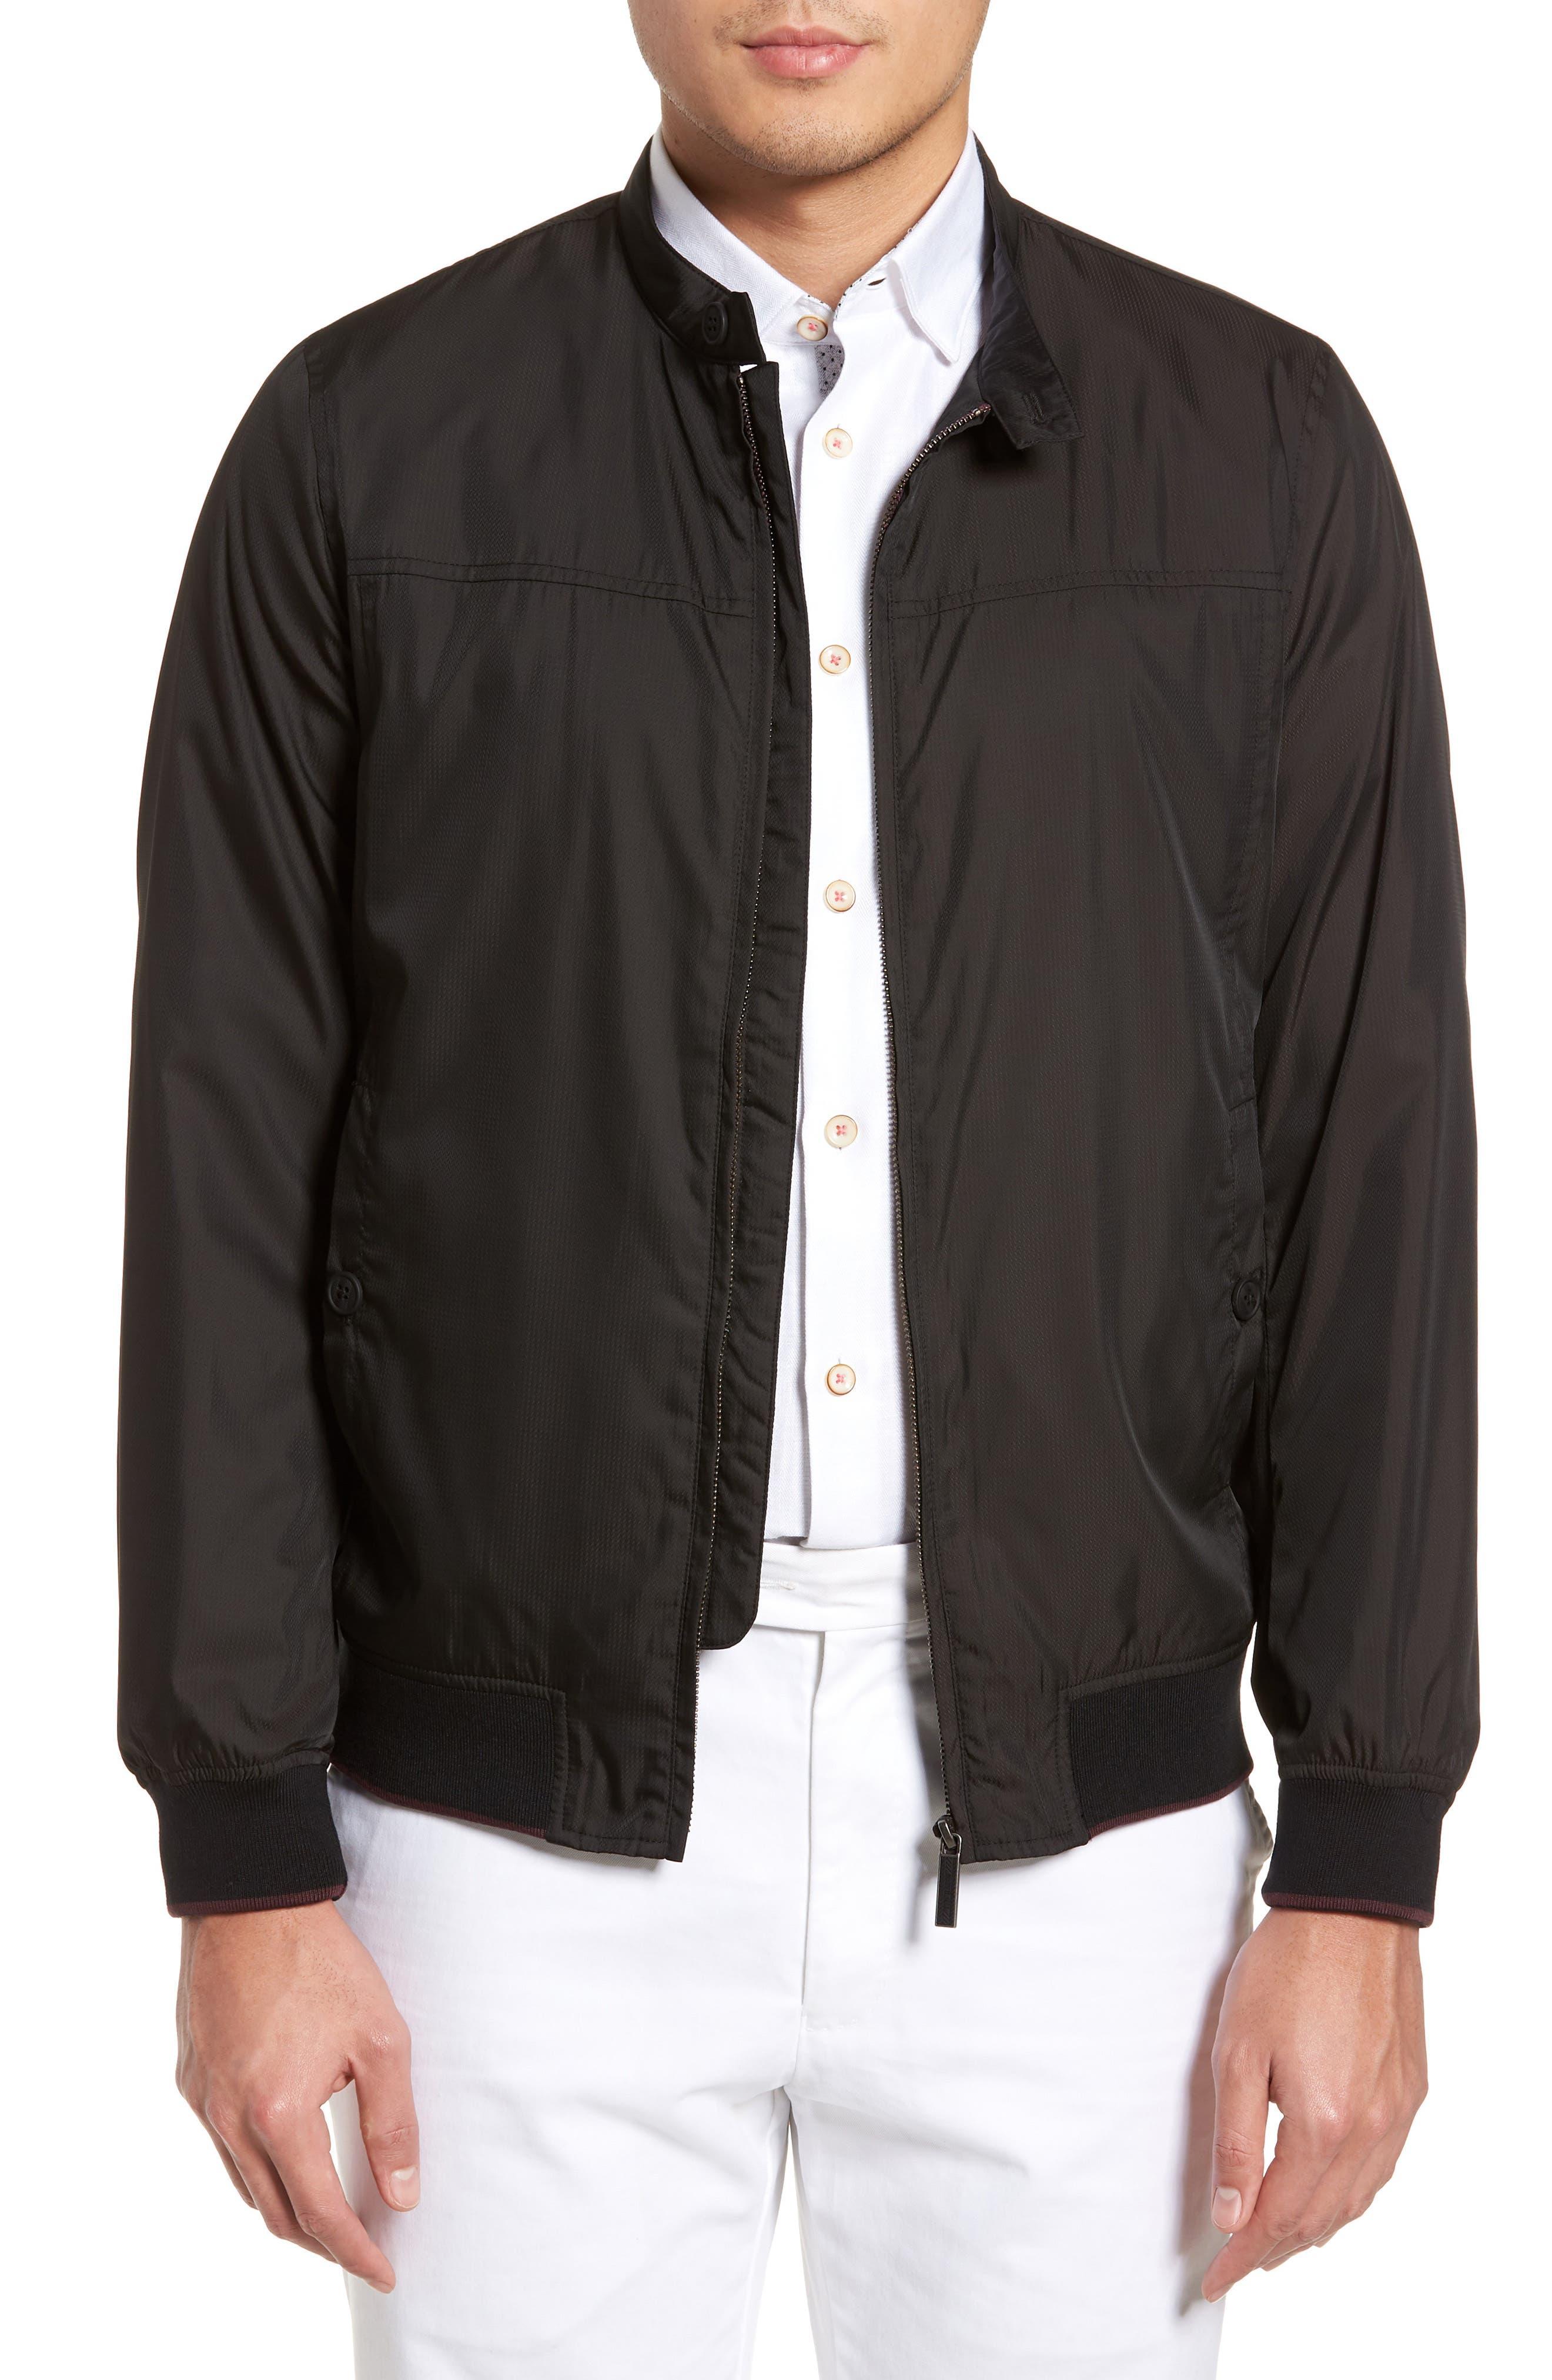 Calgar Nylon Bomber Jacket,                             Main thumbnail 1, color,                             Black